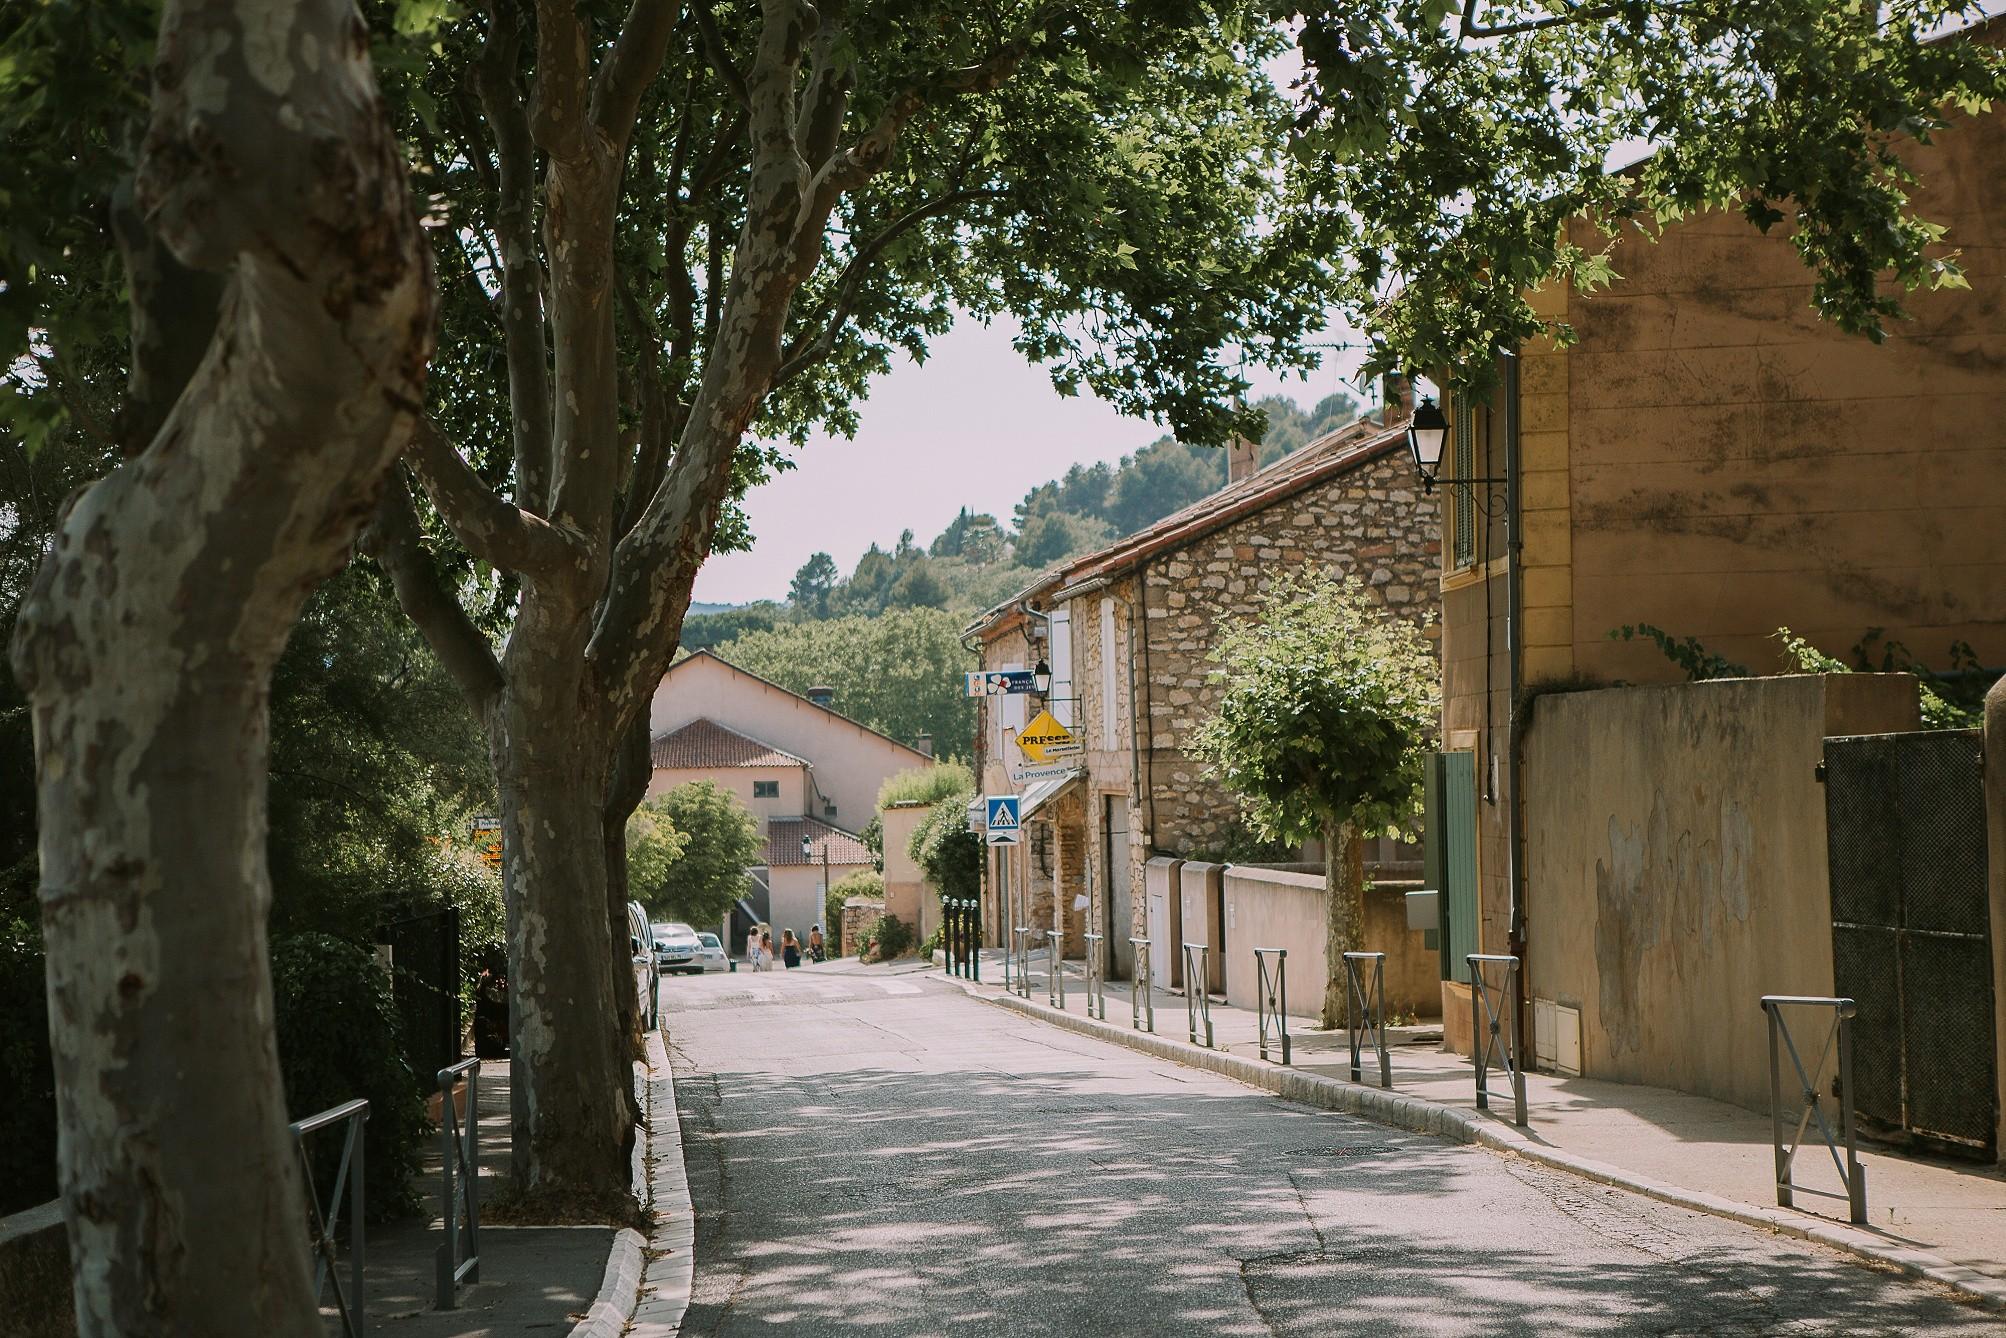 katerynaphotos-mariage-photographe-puyloubier-provence-aix-en-provence-sud-de-la-france_0385.jpg